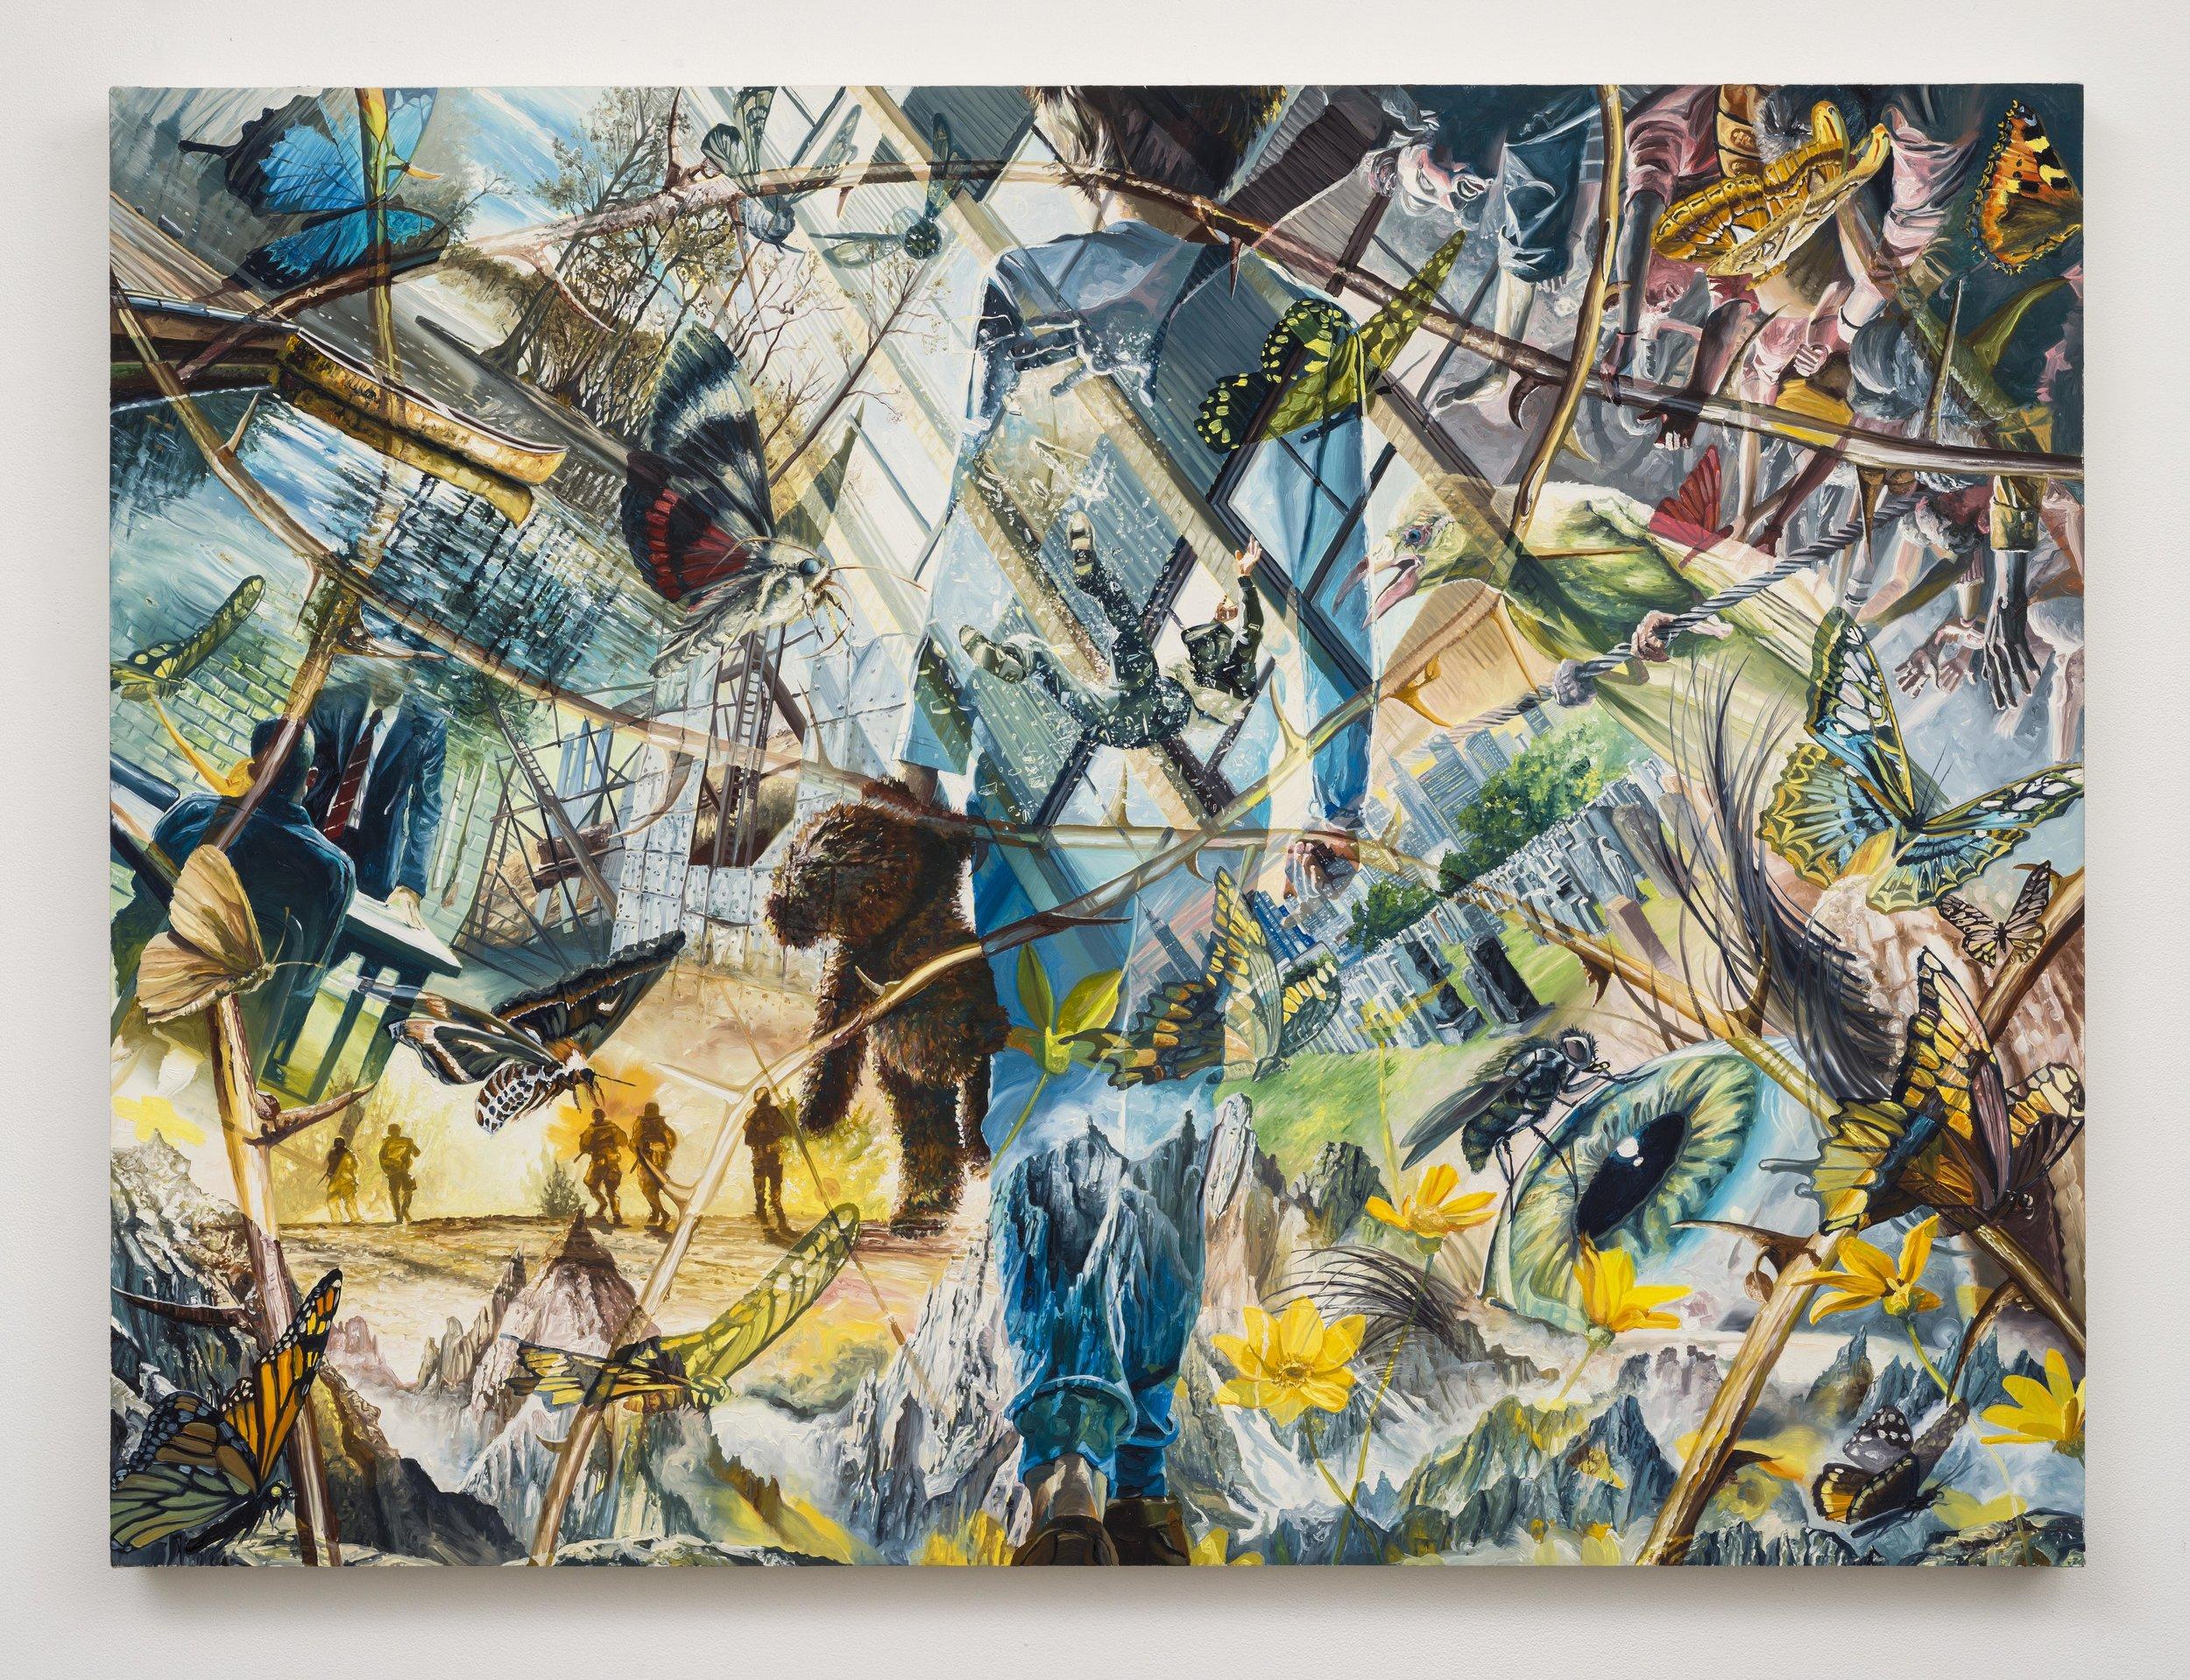 Chad Robertson Artist 2012-2015 Untitled 004